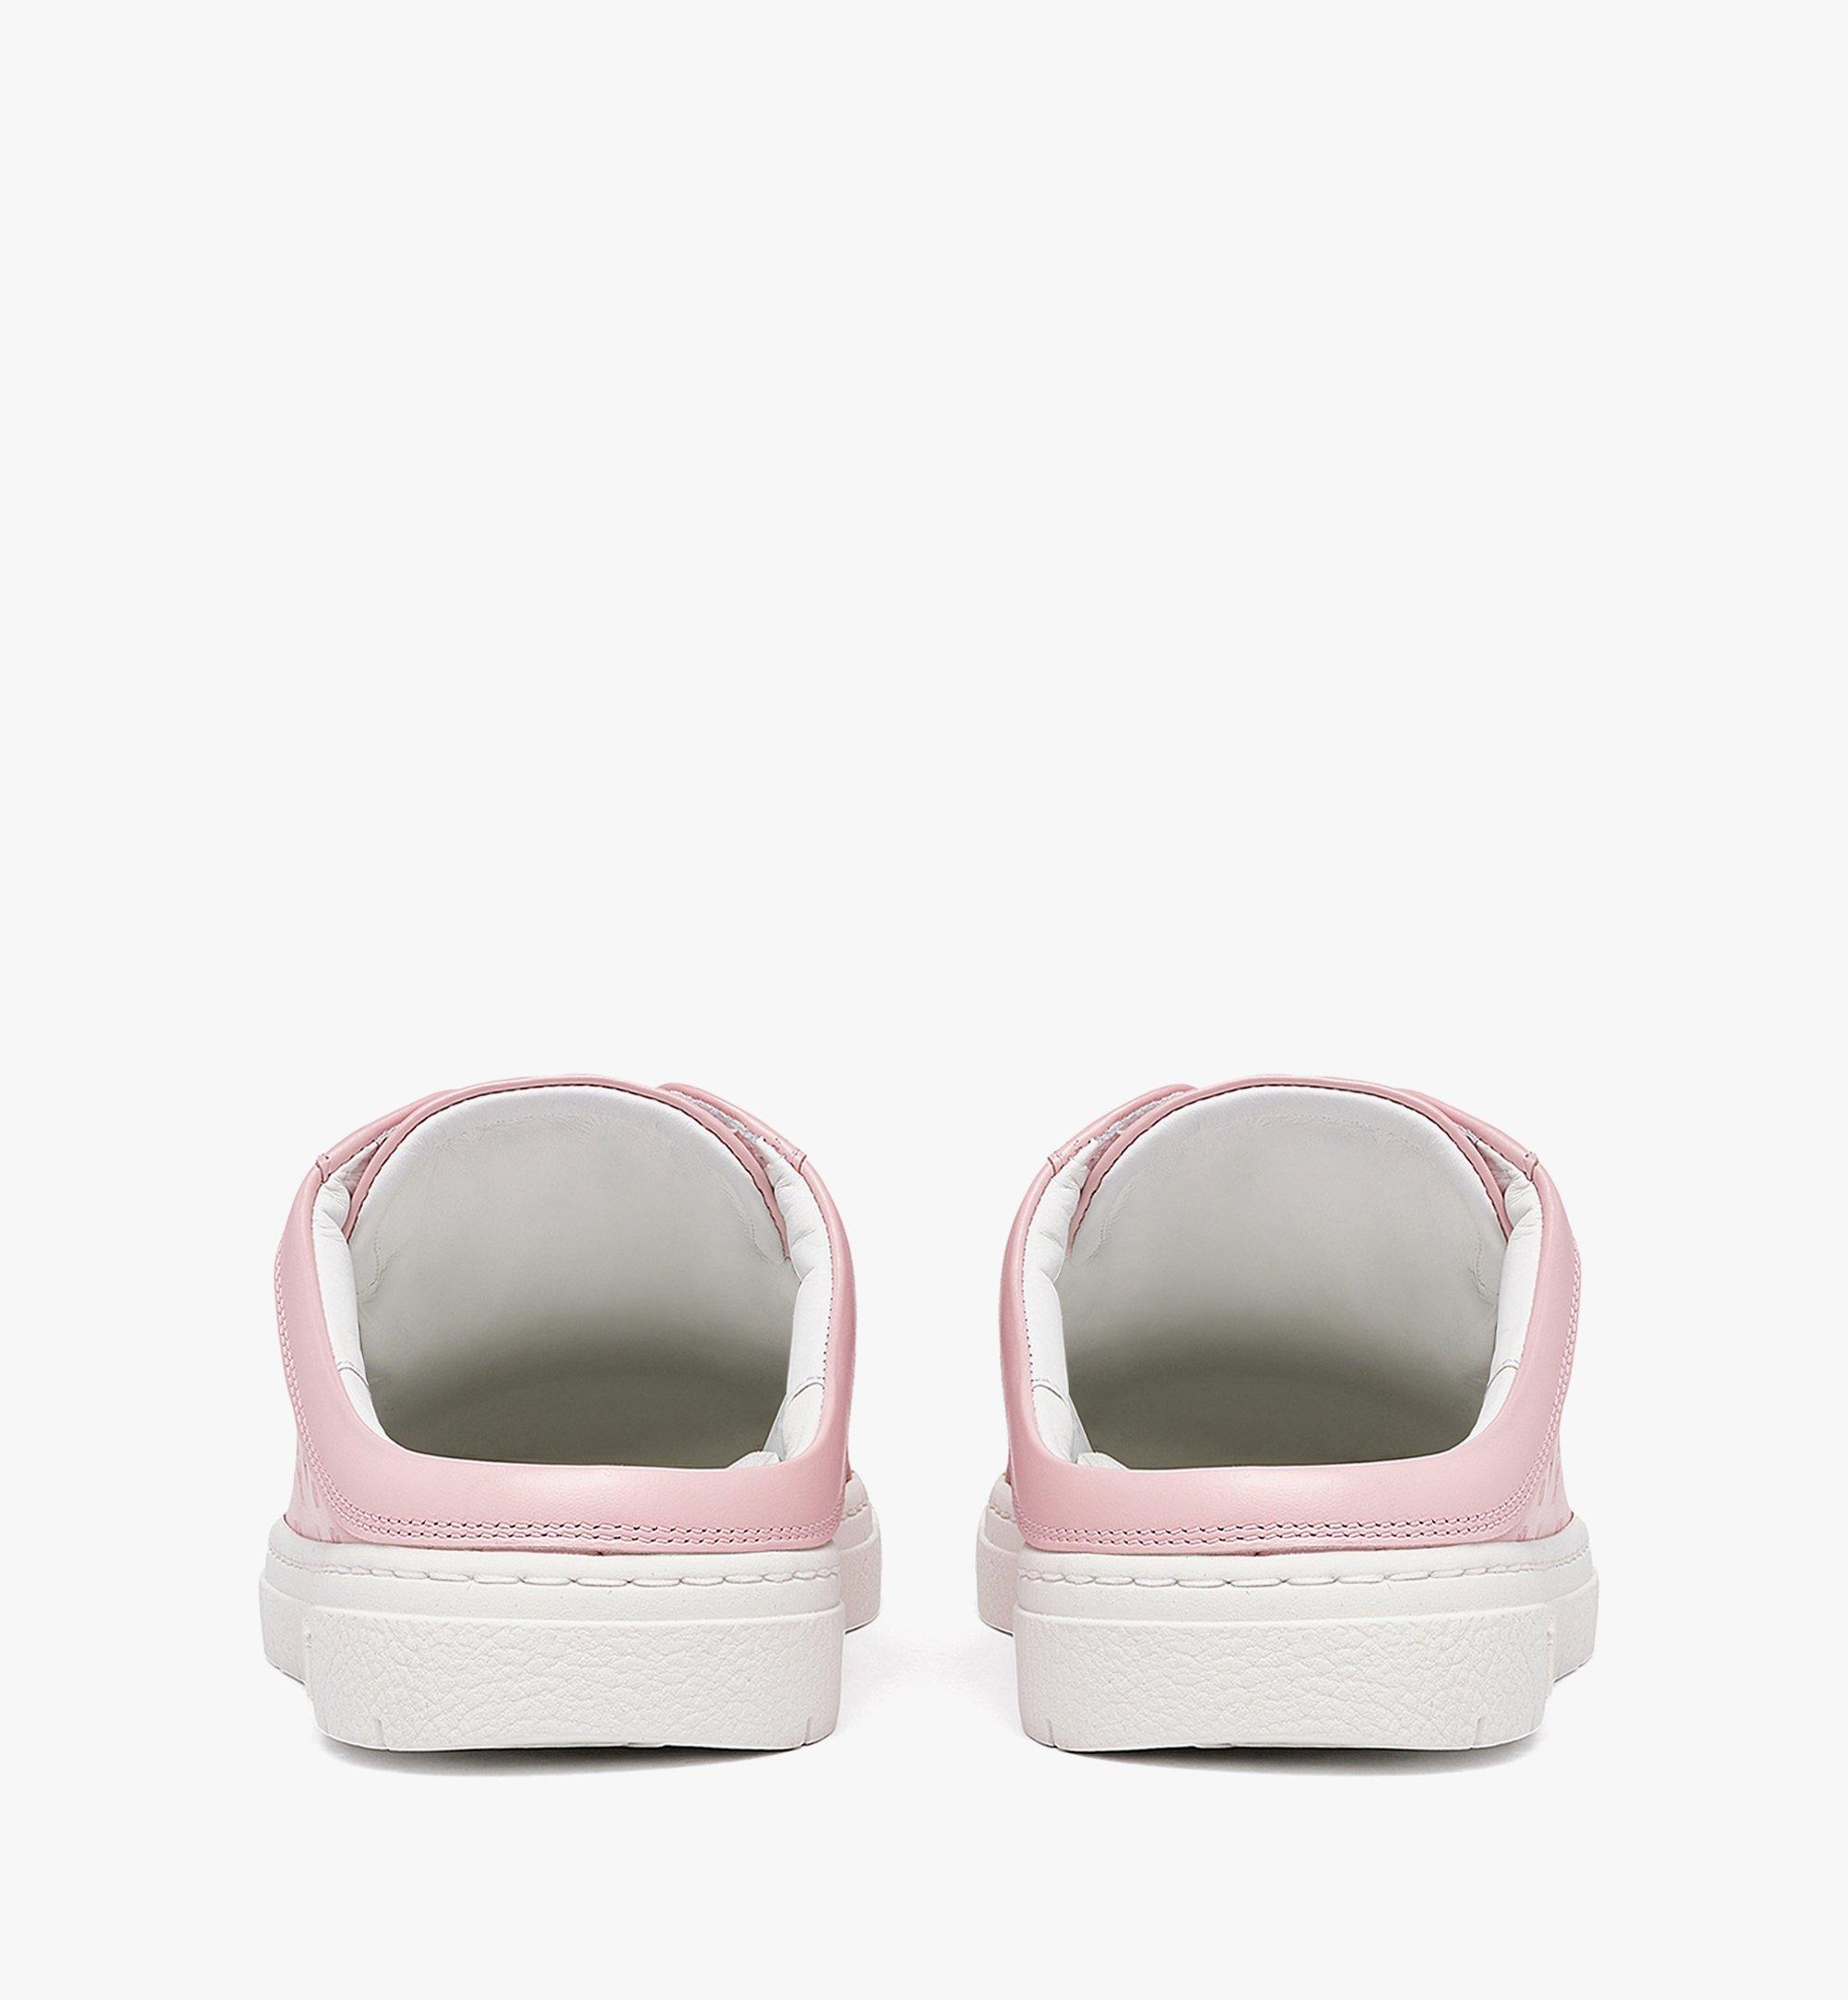 MCM Women's Terrain Lo Open Back Sneakers in Monogram Calf Leather Pink MESBAMM03QH036 Alternate View 3